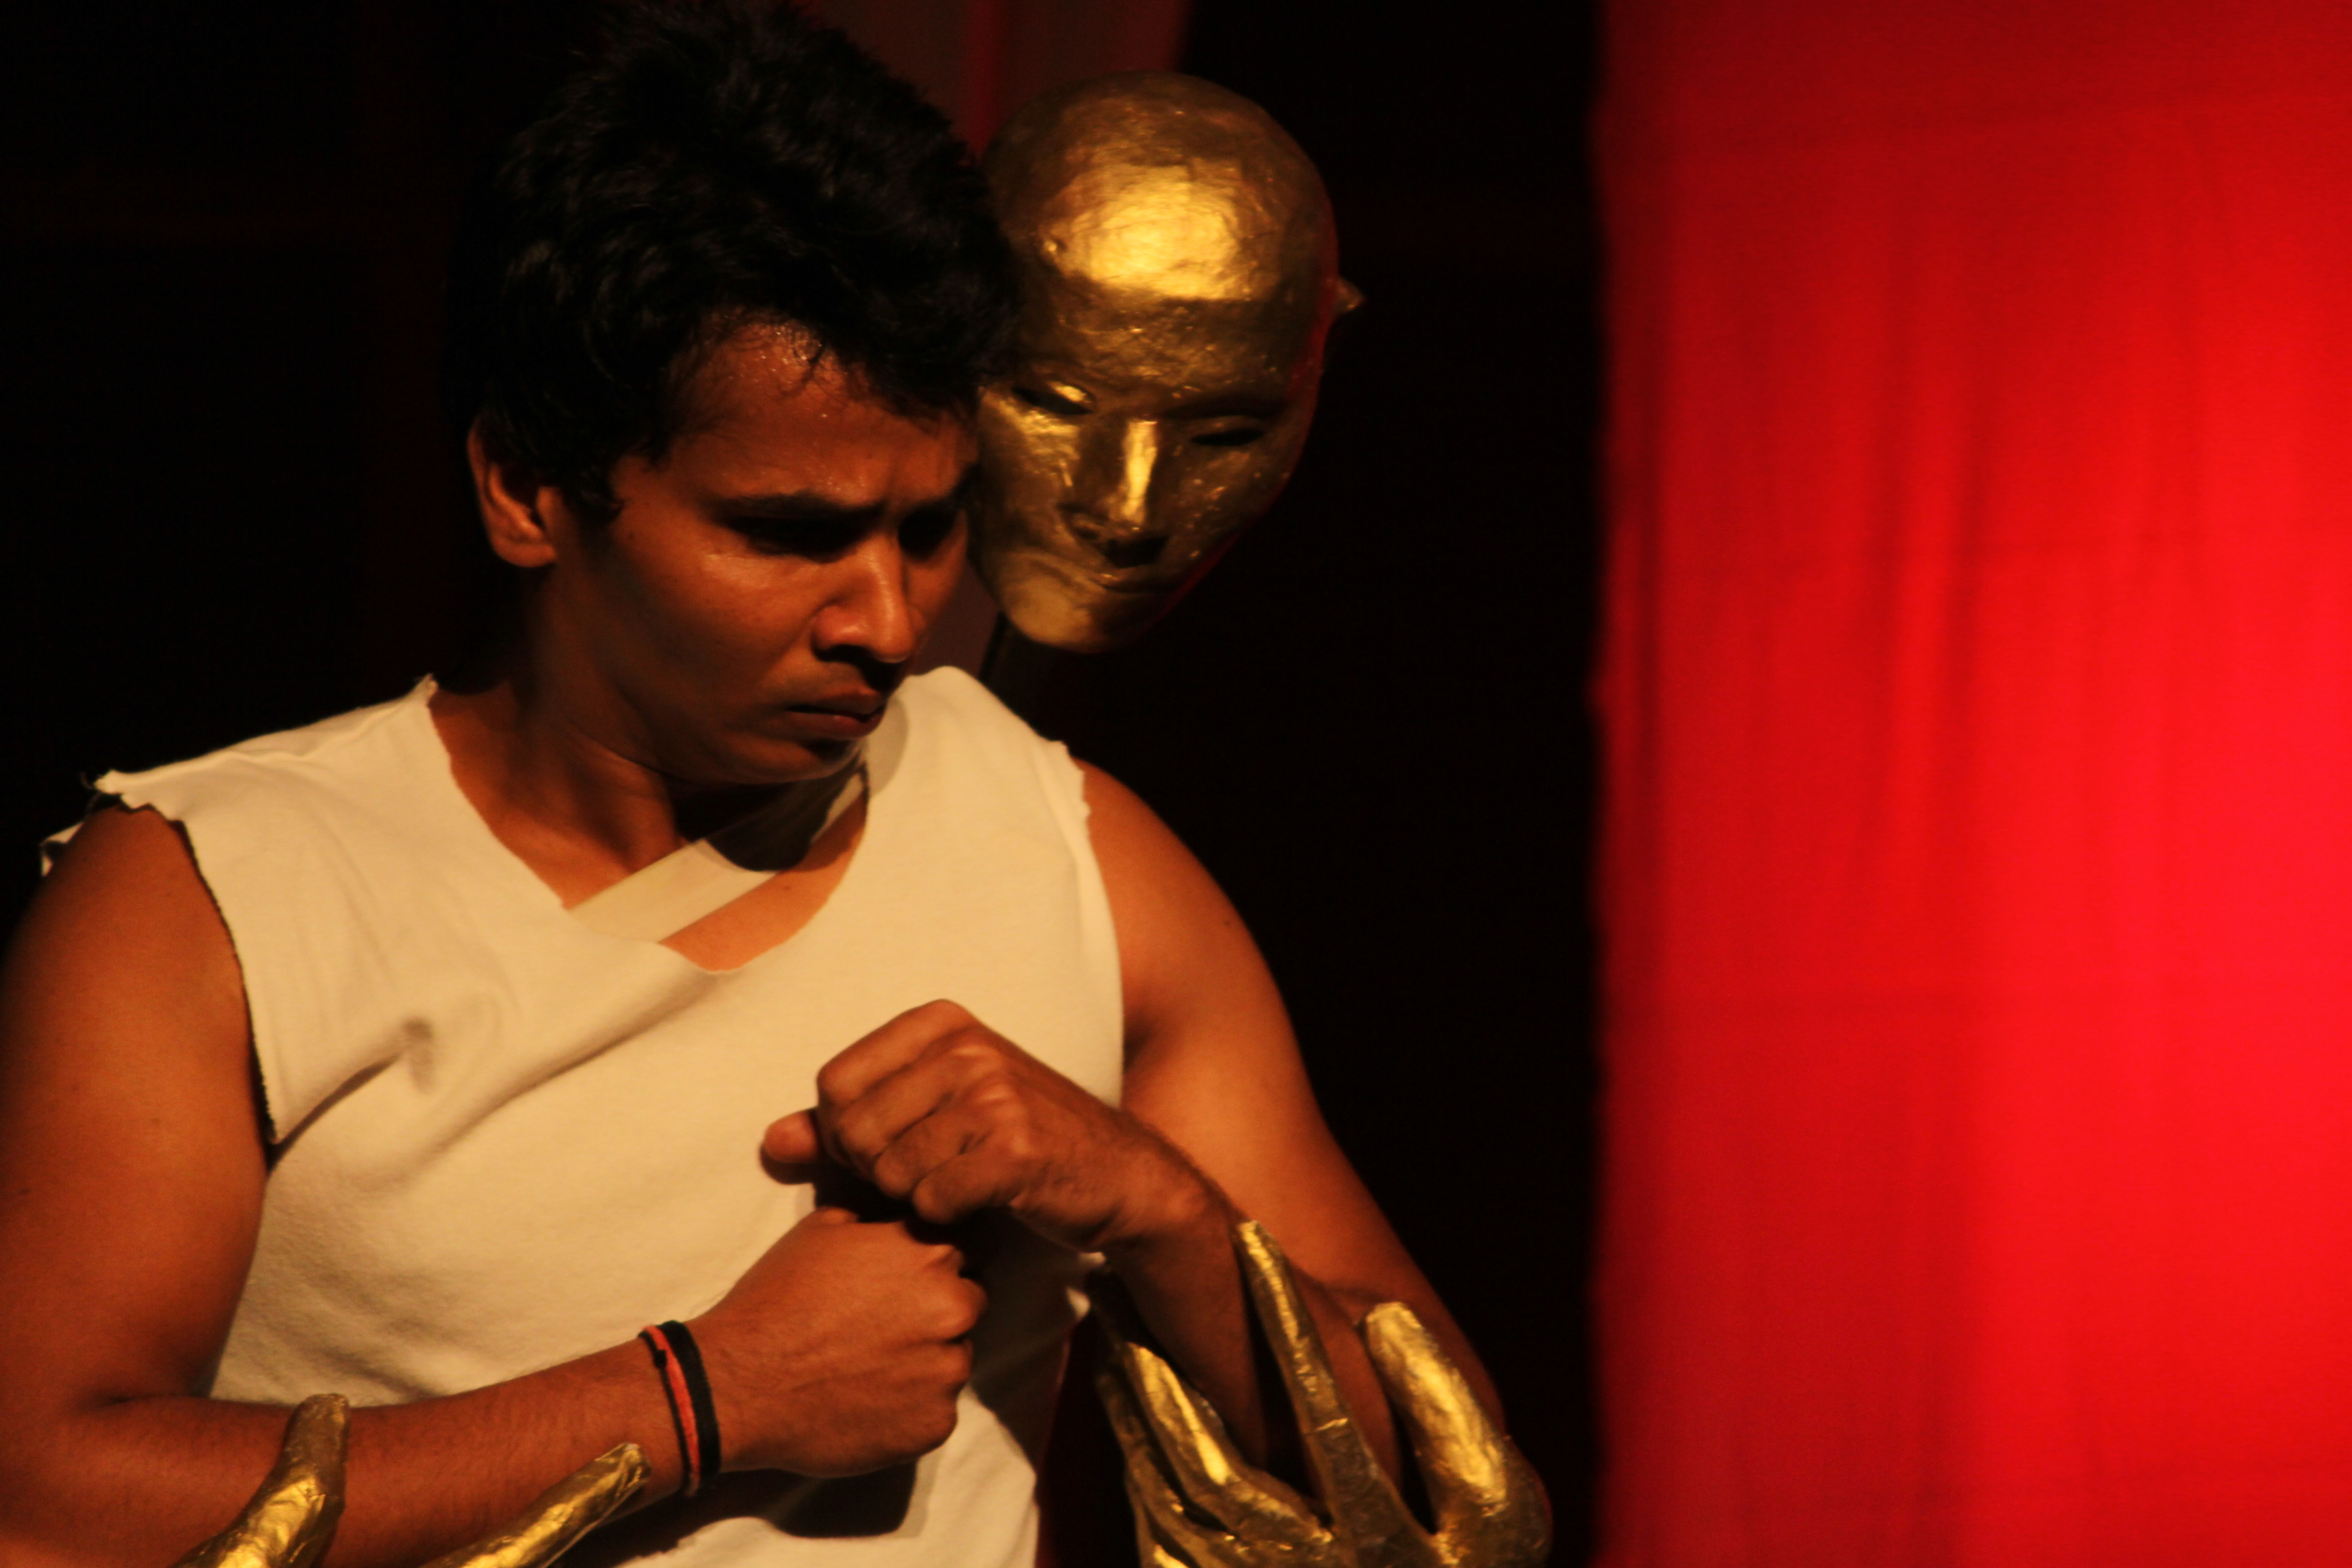 <em>Mahabharata</em> par Katkatha (New Delhi), concept et mise en scène : Anurupa Roy, marionnettistes : Mohammad Shameem, Vivek Kumar, Anurupa Roy, Avinash Kumar, Gunduraju. Acteur et masque